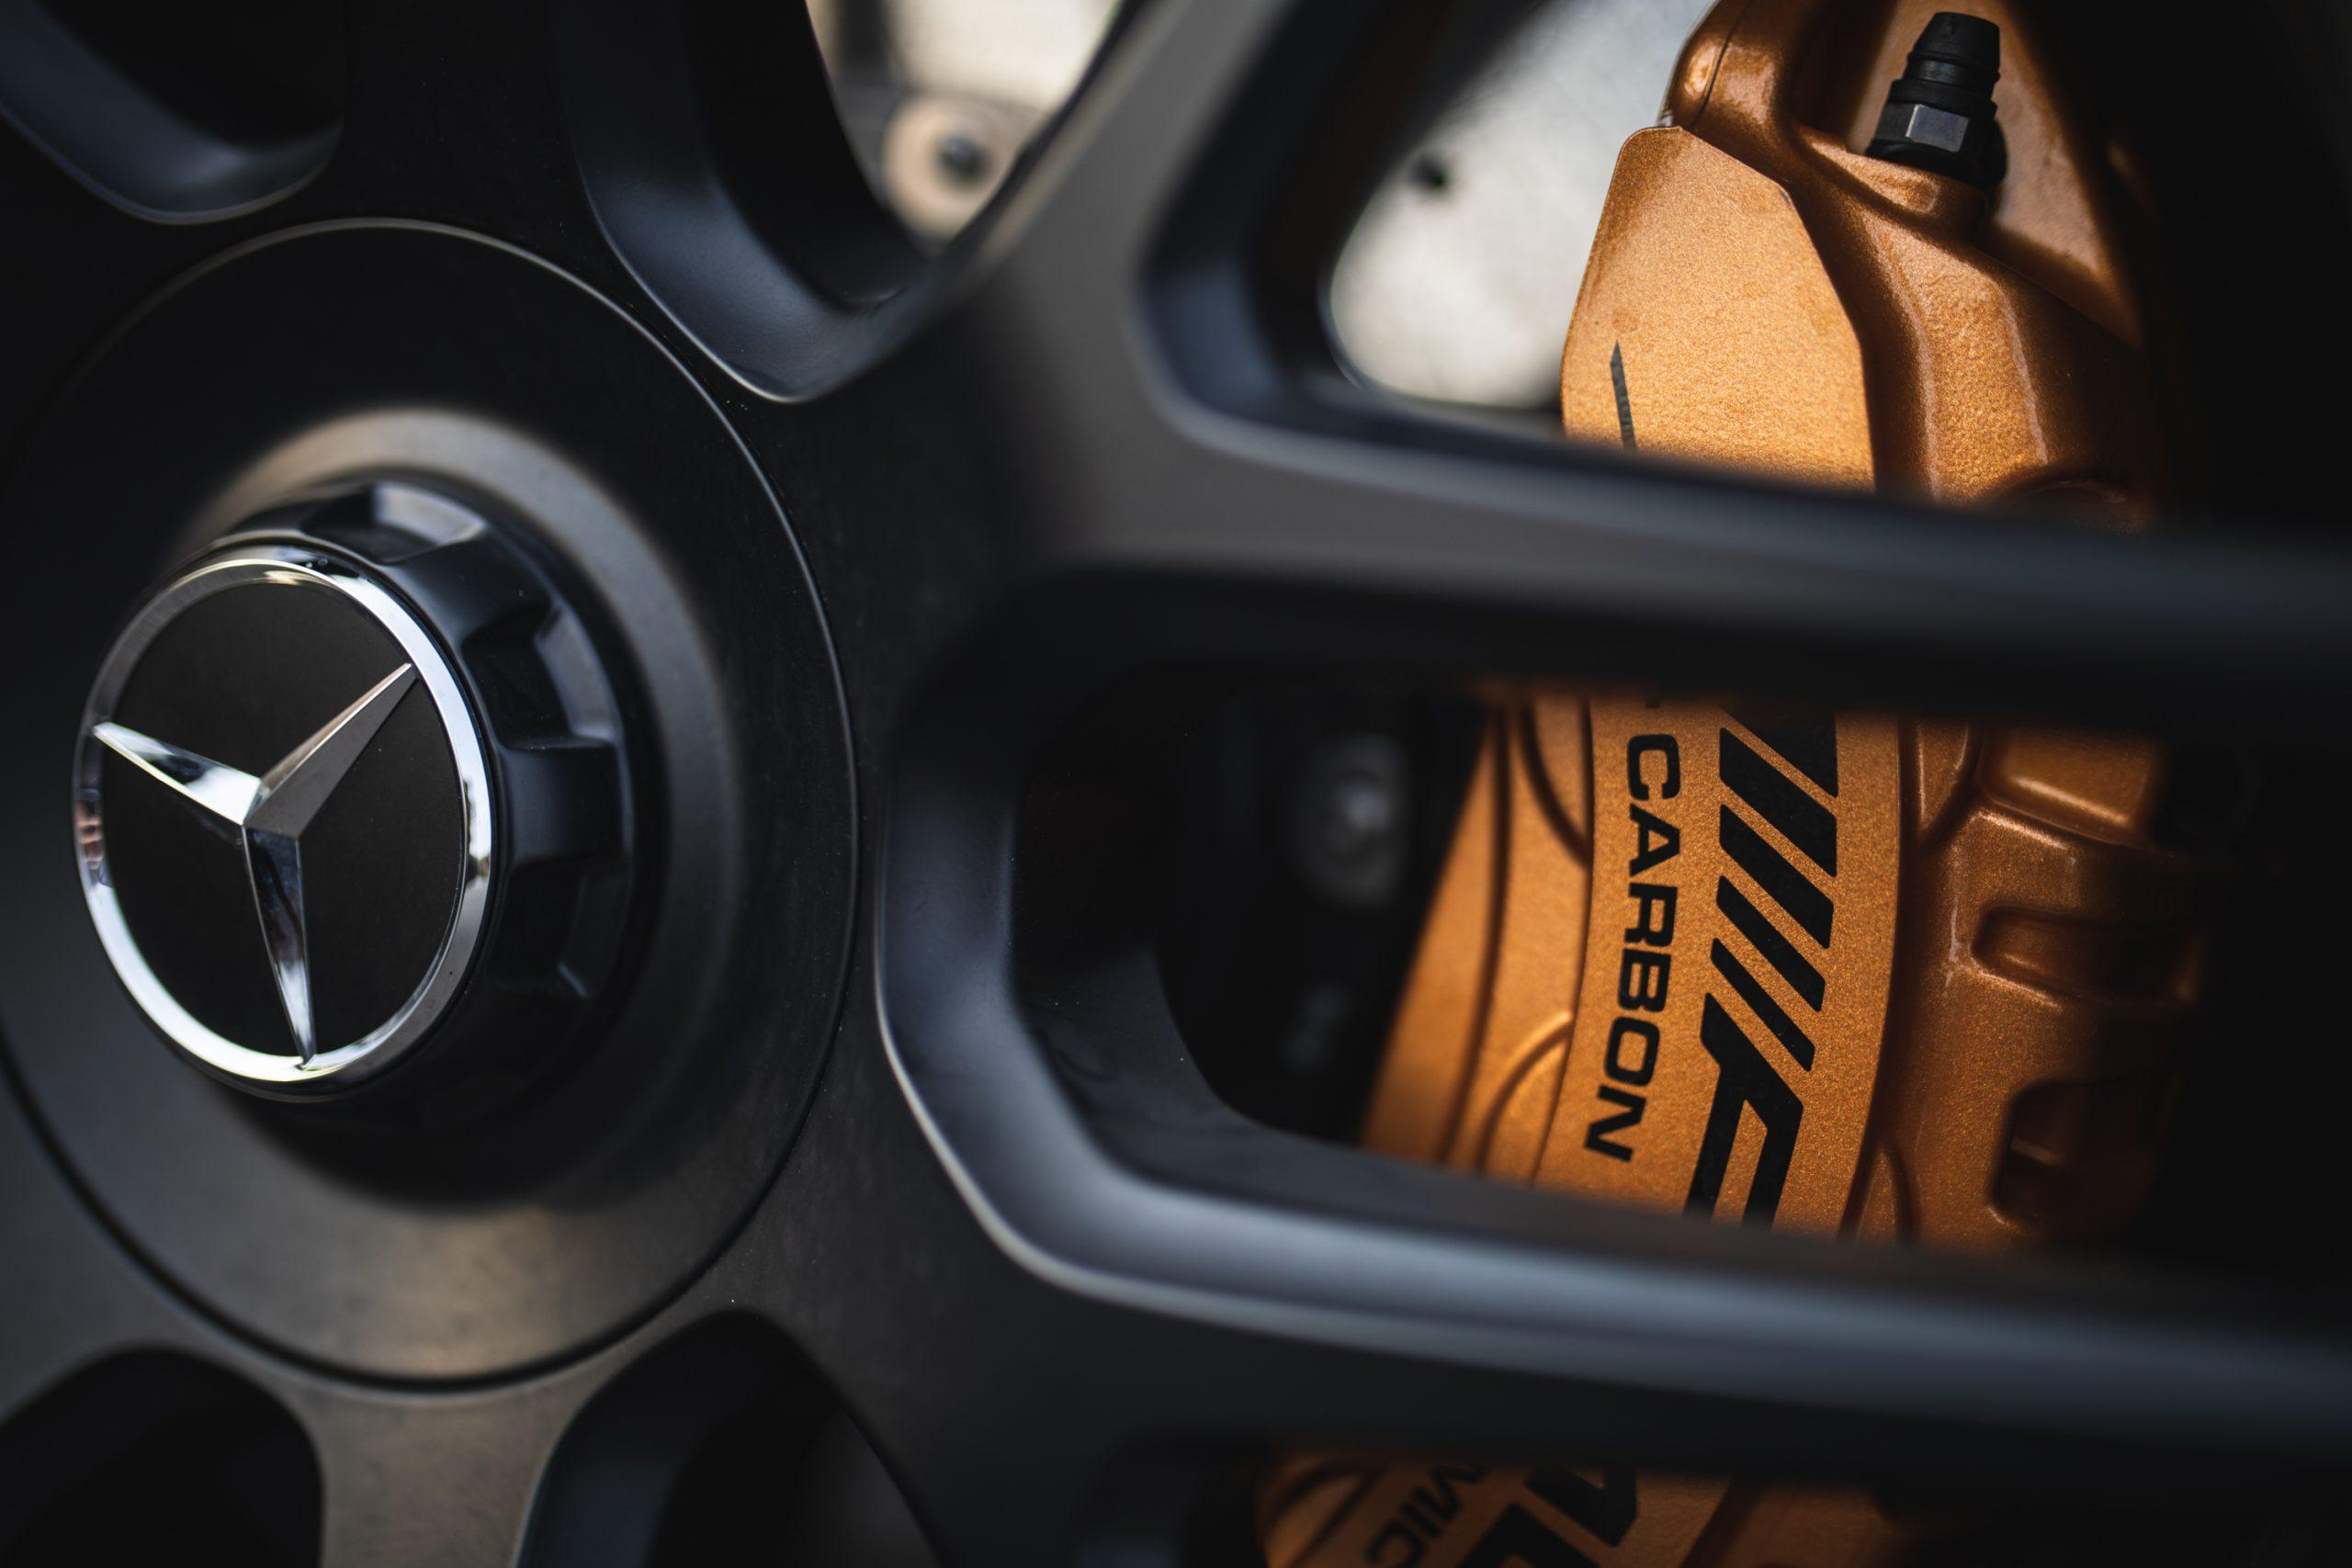 2021 Mercedes-AMG E63 S brake caliper rotor wheel detail